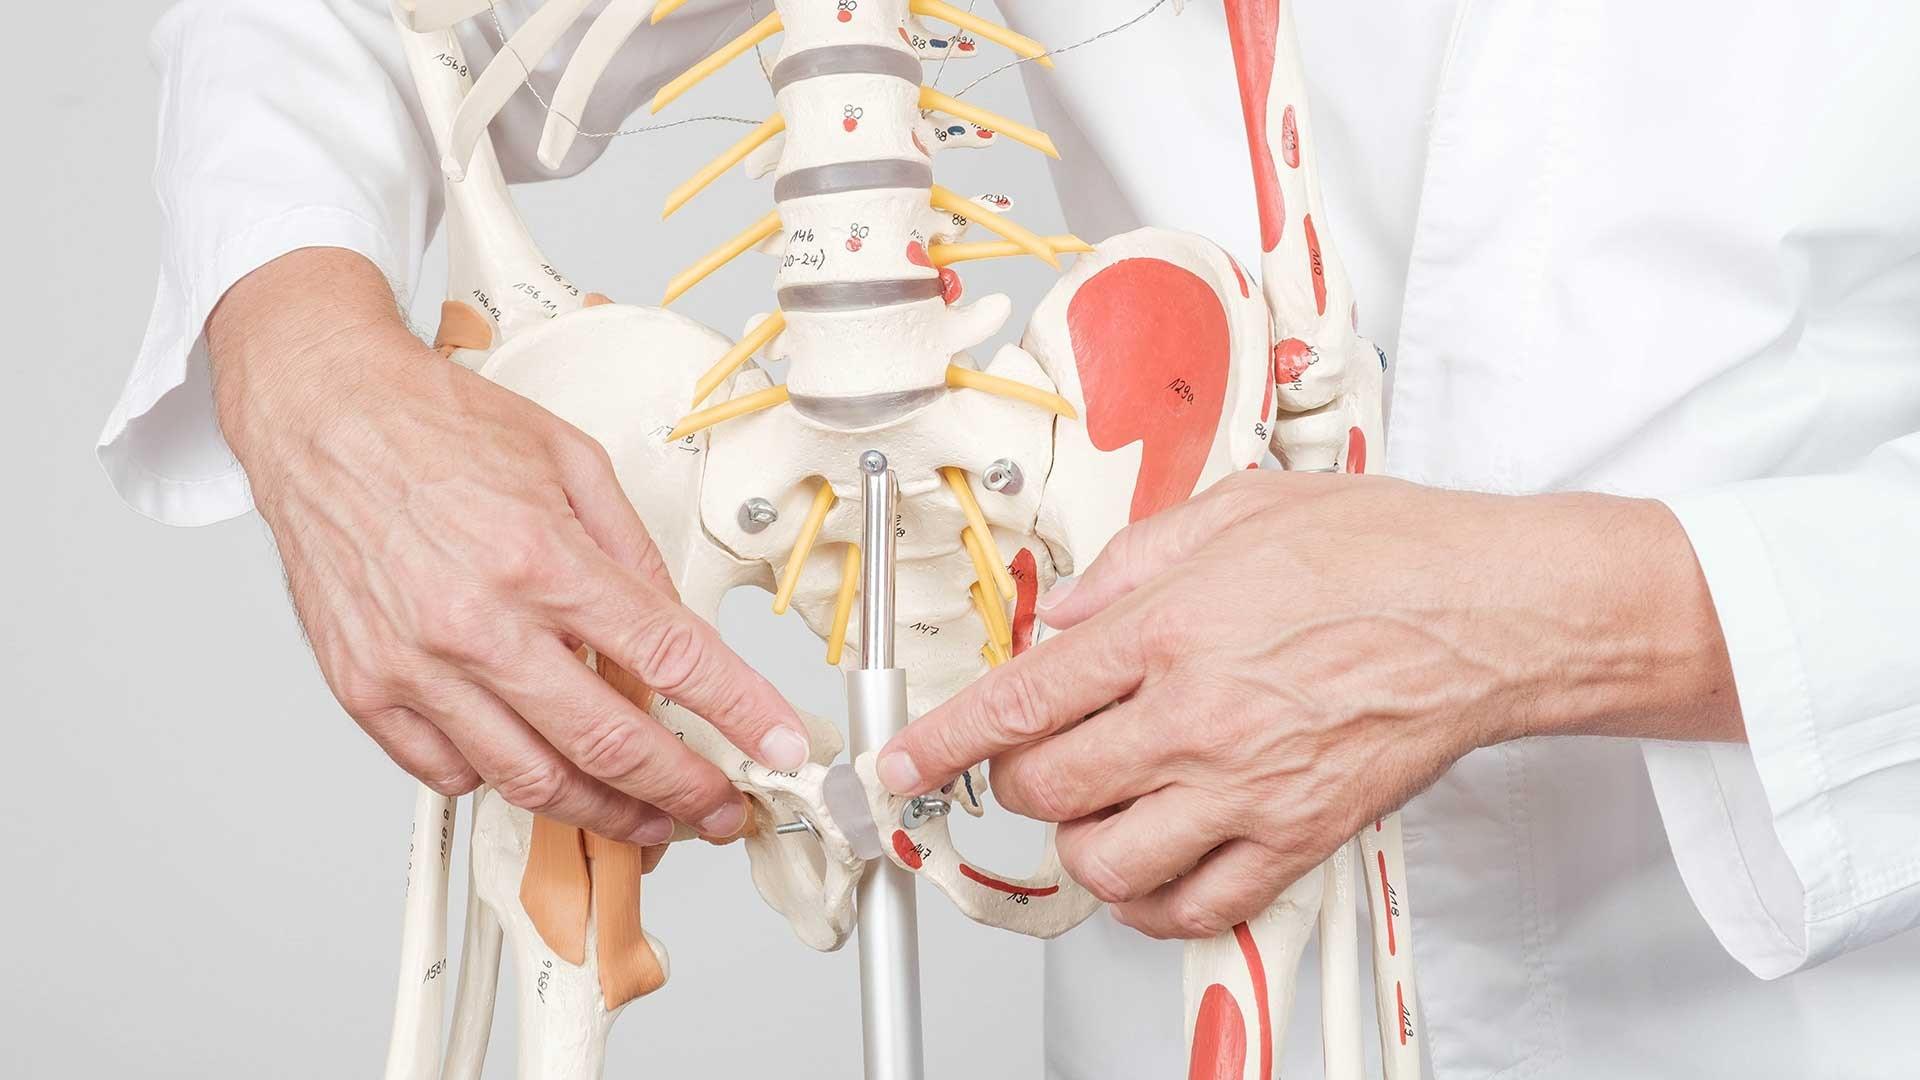 Seronegativne-spondiloartropatije-i-seronegativni-spondiloartritisi